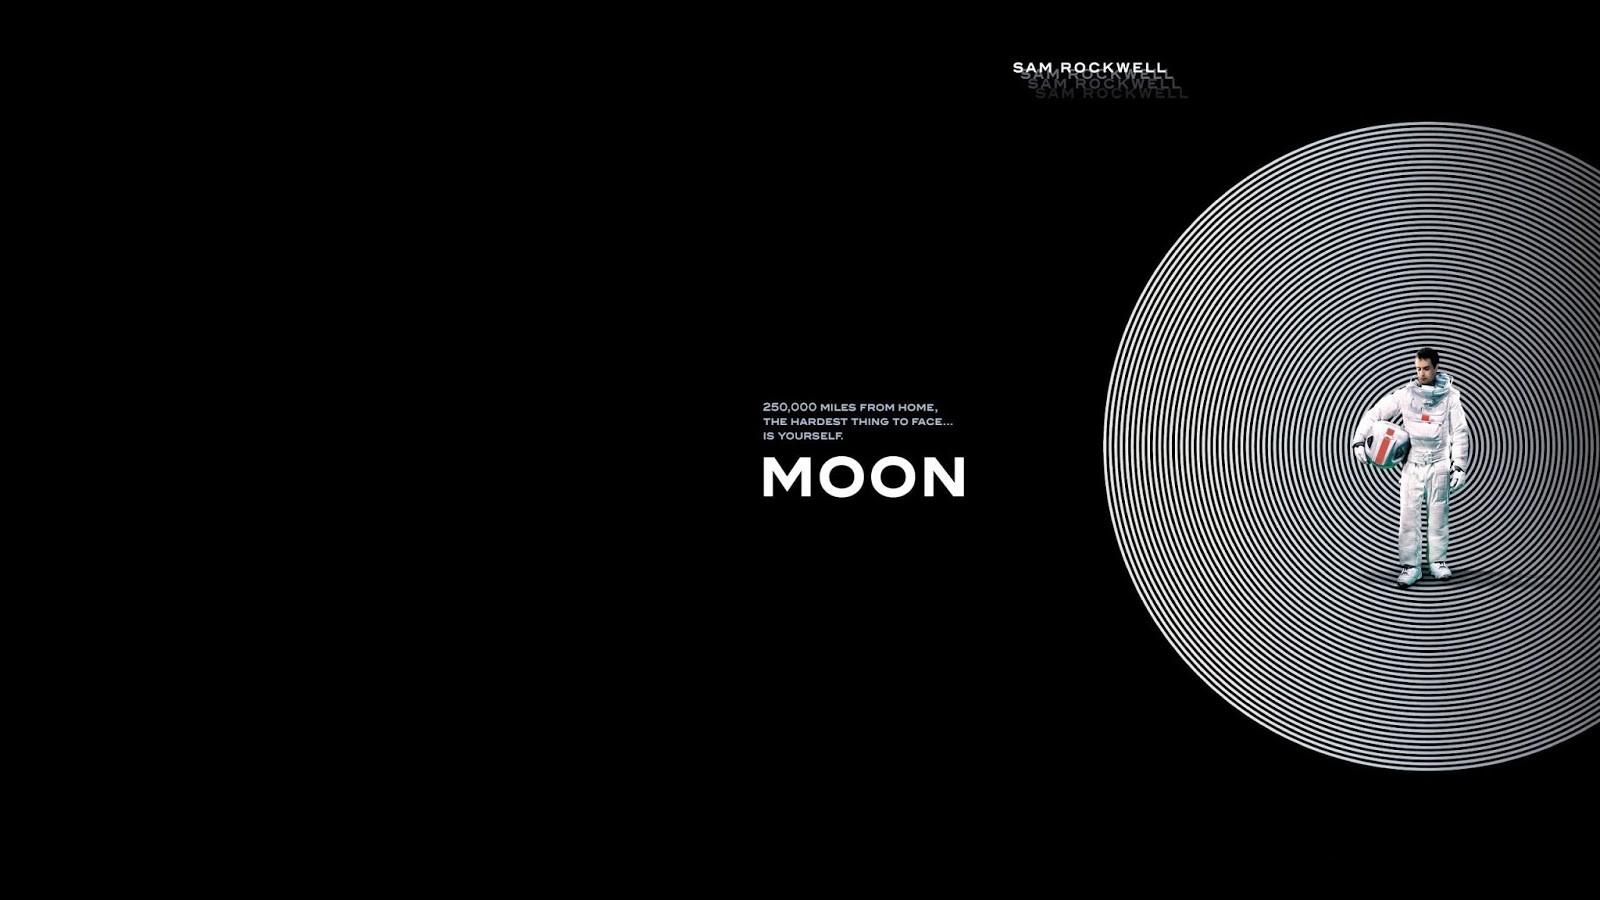 Moon movie. Mute coming to Netflix